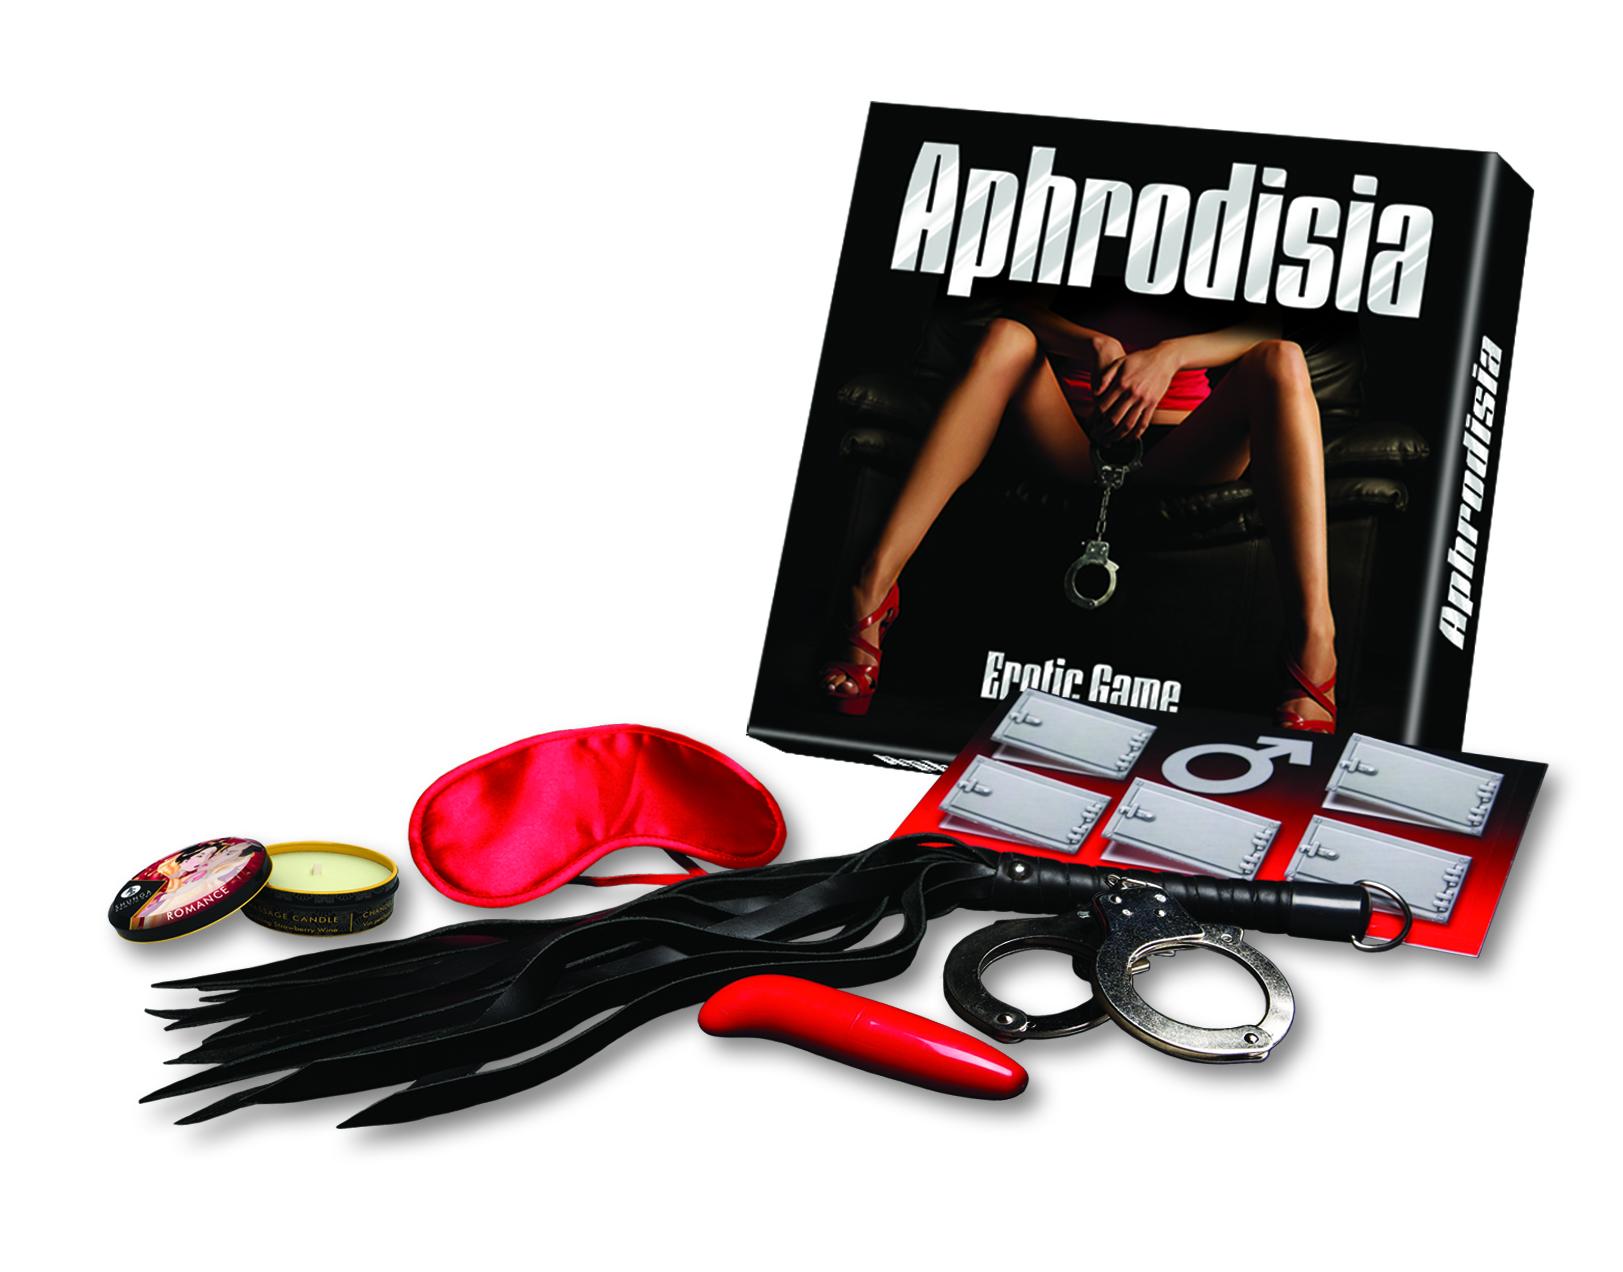 APHRODISIA EROTIC GAME